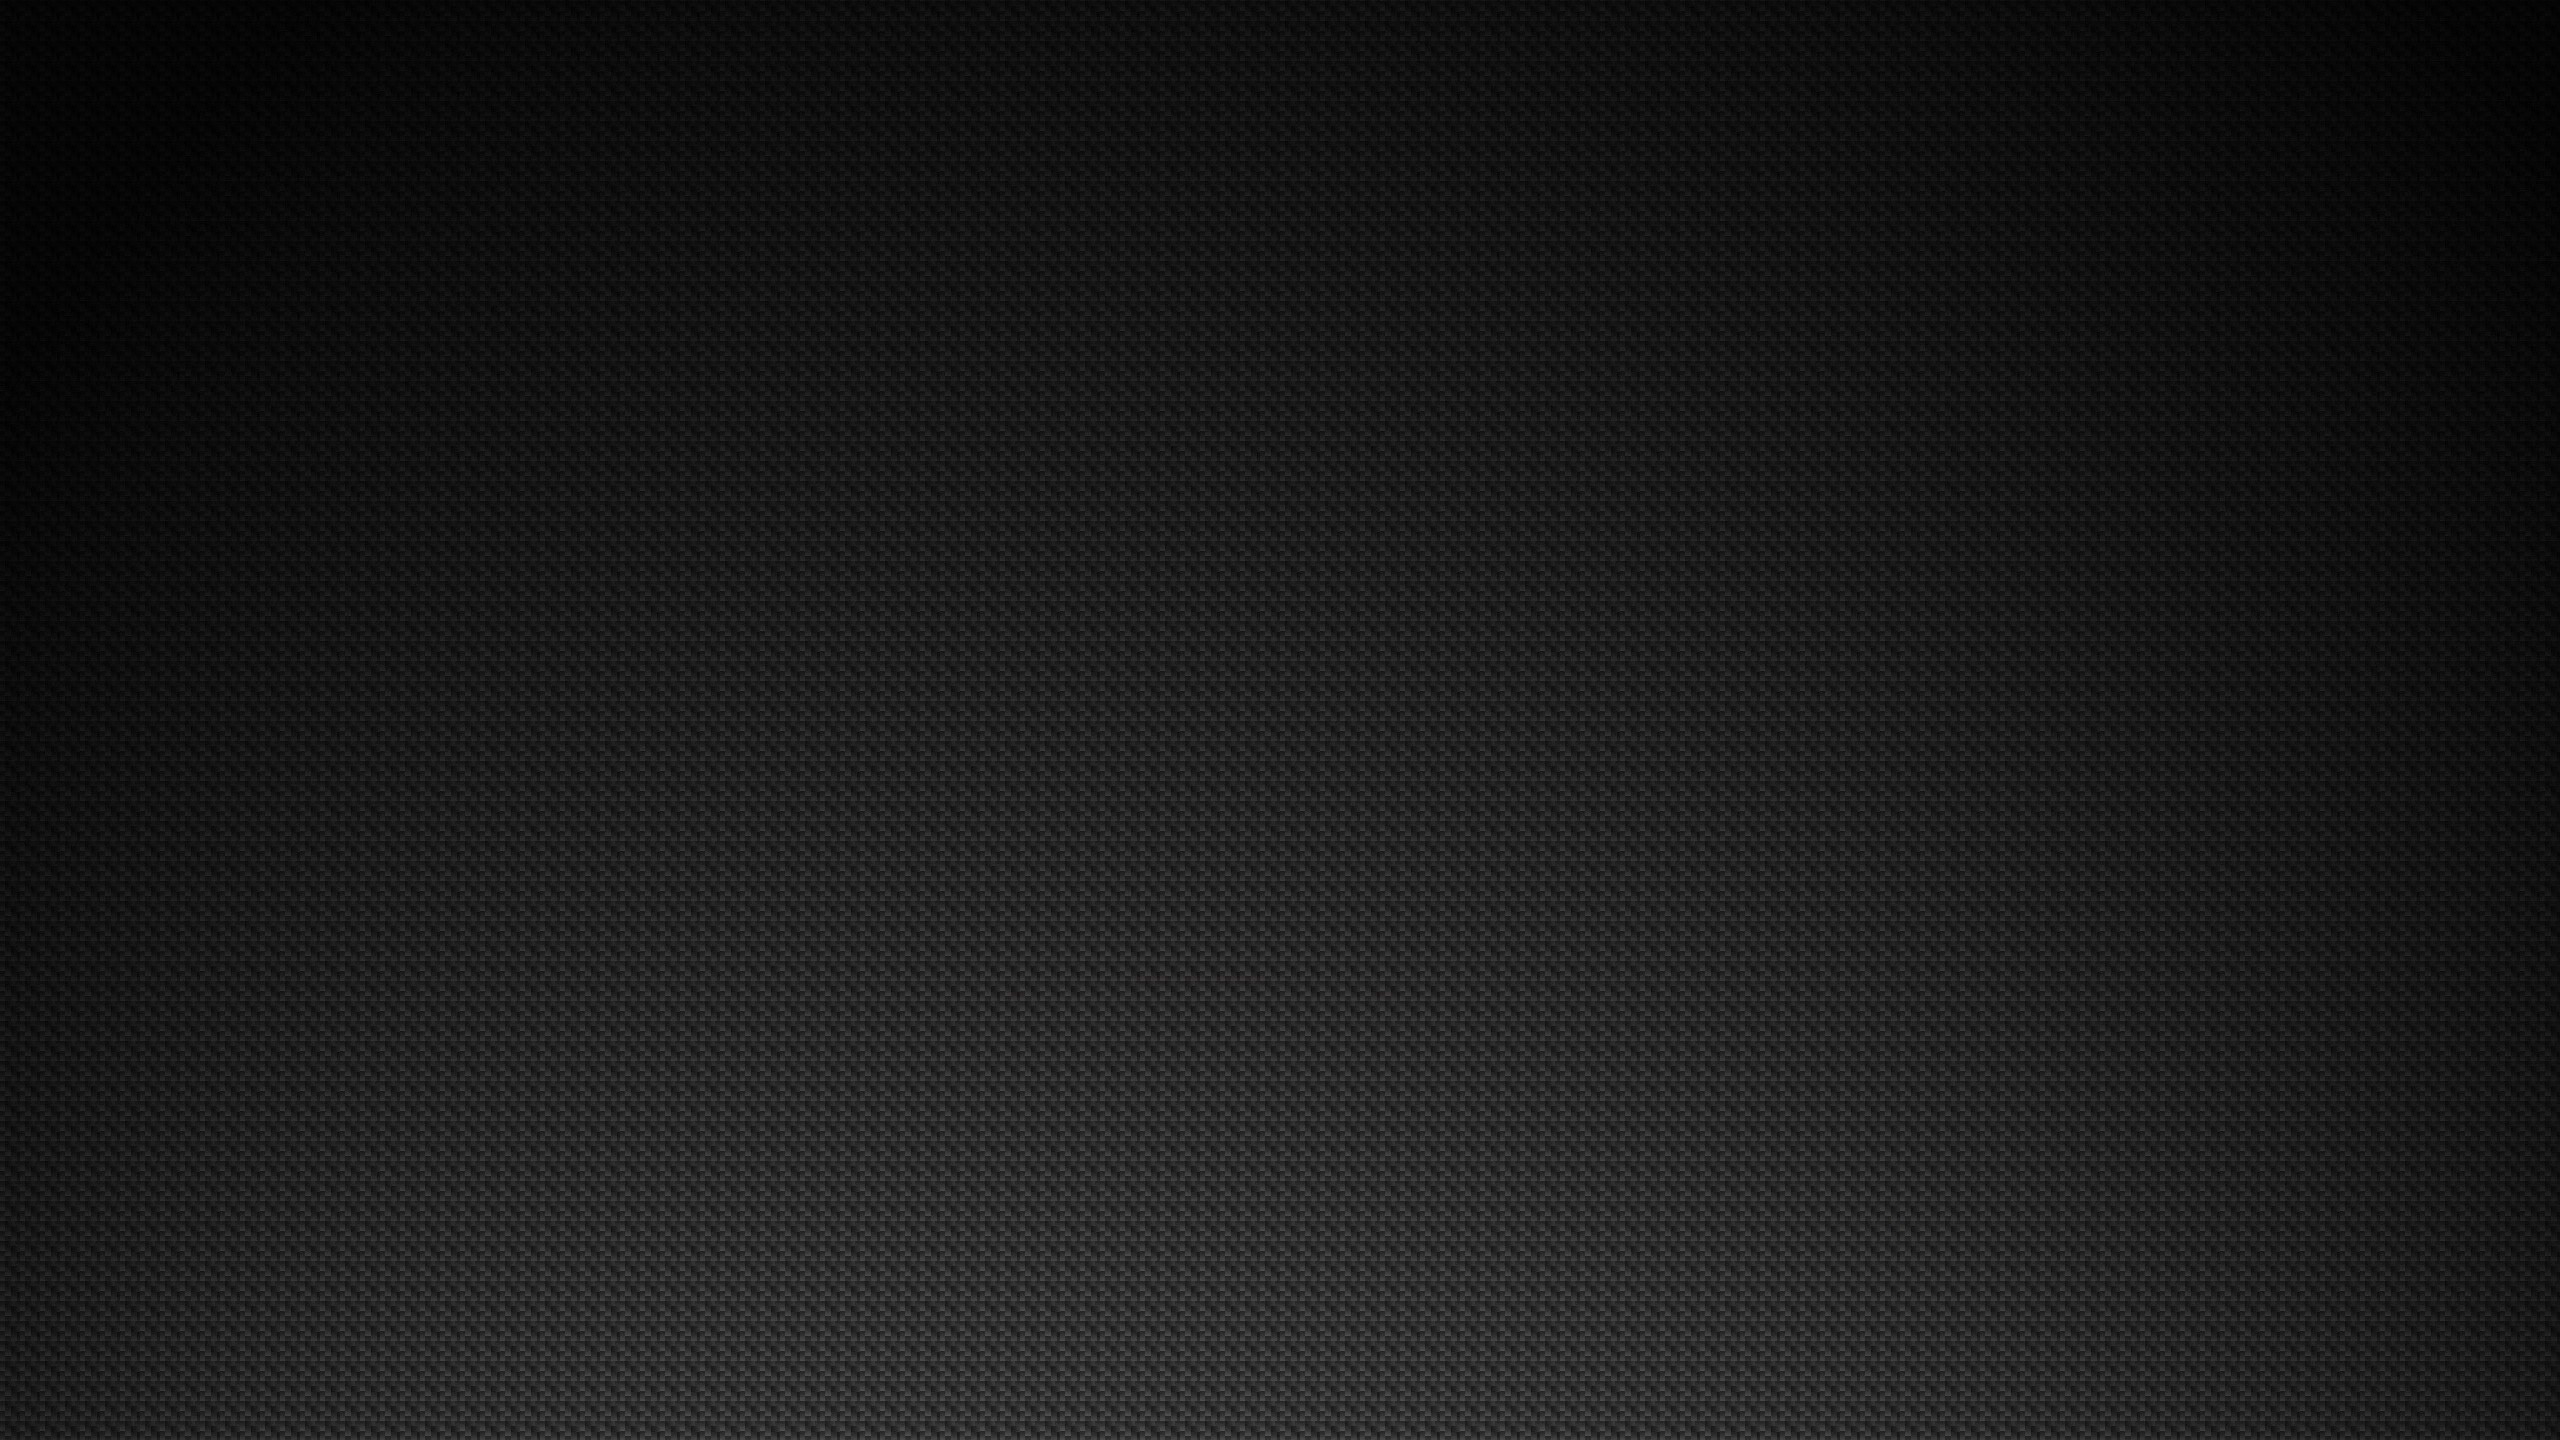 Carbon fiber background Mac Wallpaper Download | Free Mac Wallpapers .